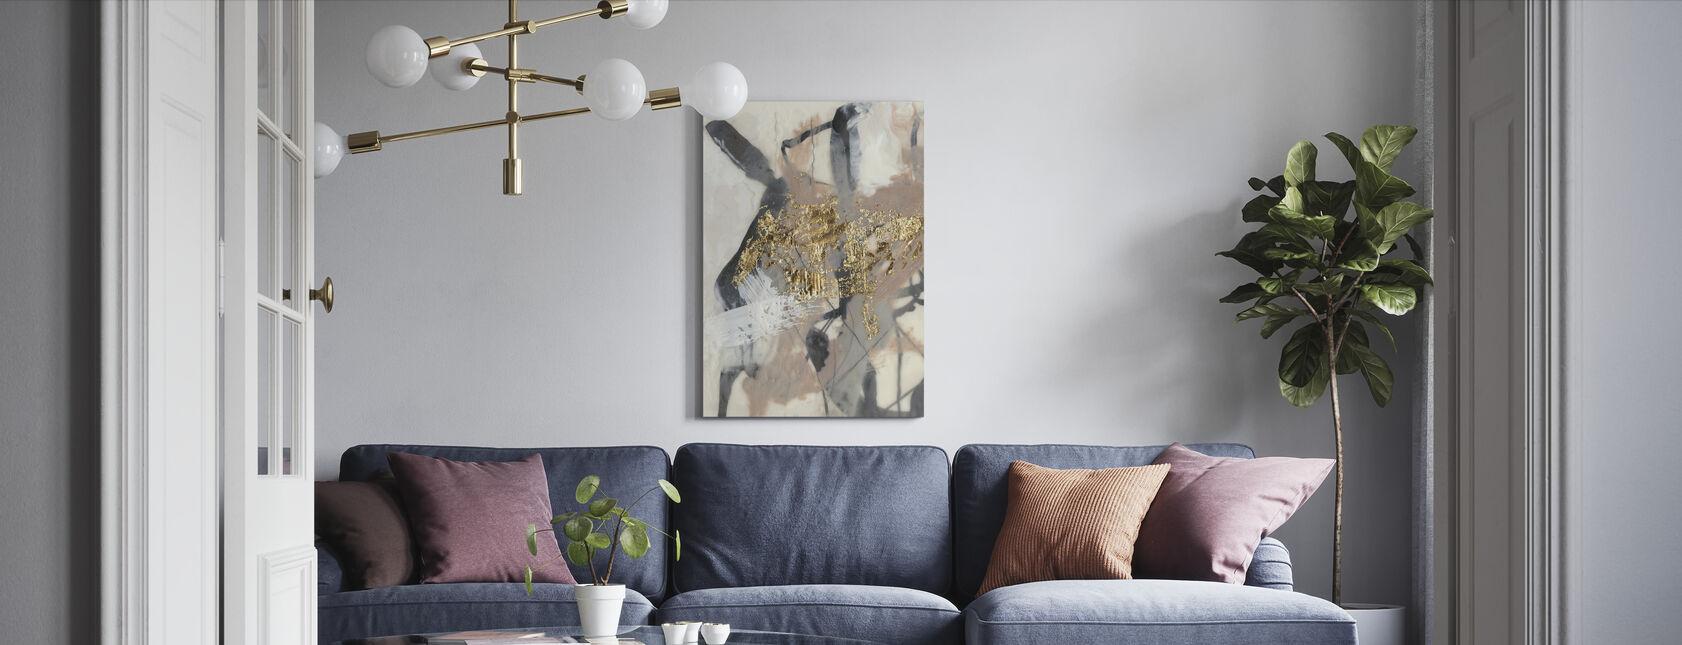 Golden Blush - Canvas print - Living Room